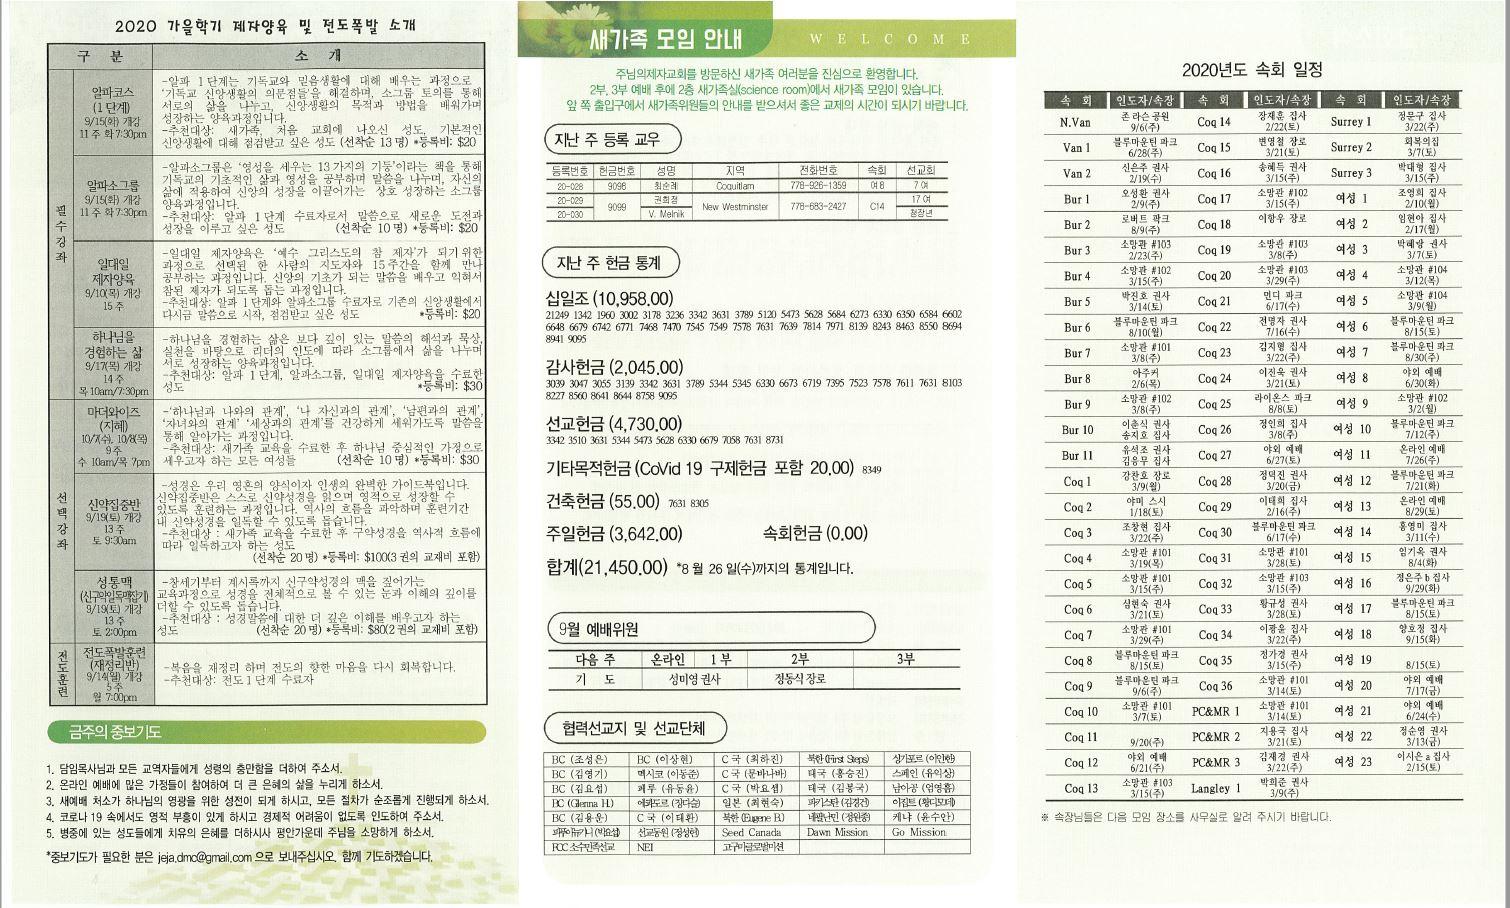 mb-file.php?path=2020%2F08%2F28%2FF515_Capture-1.JPG